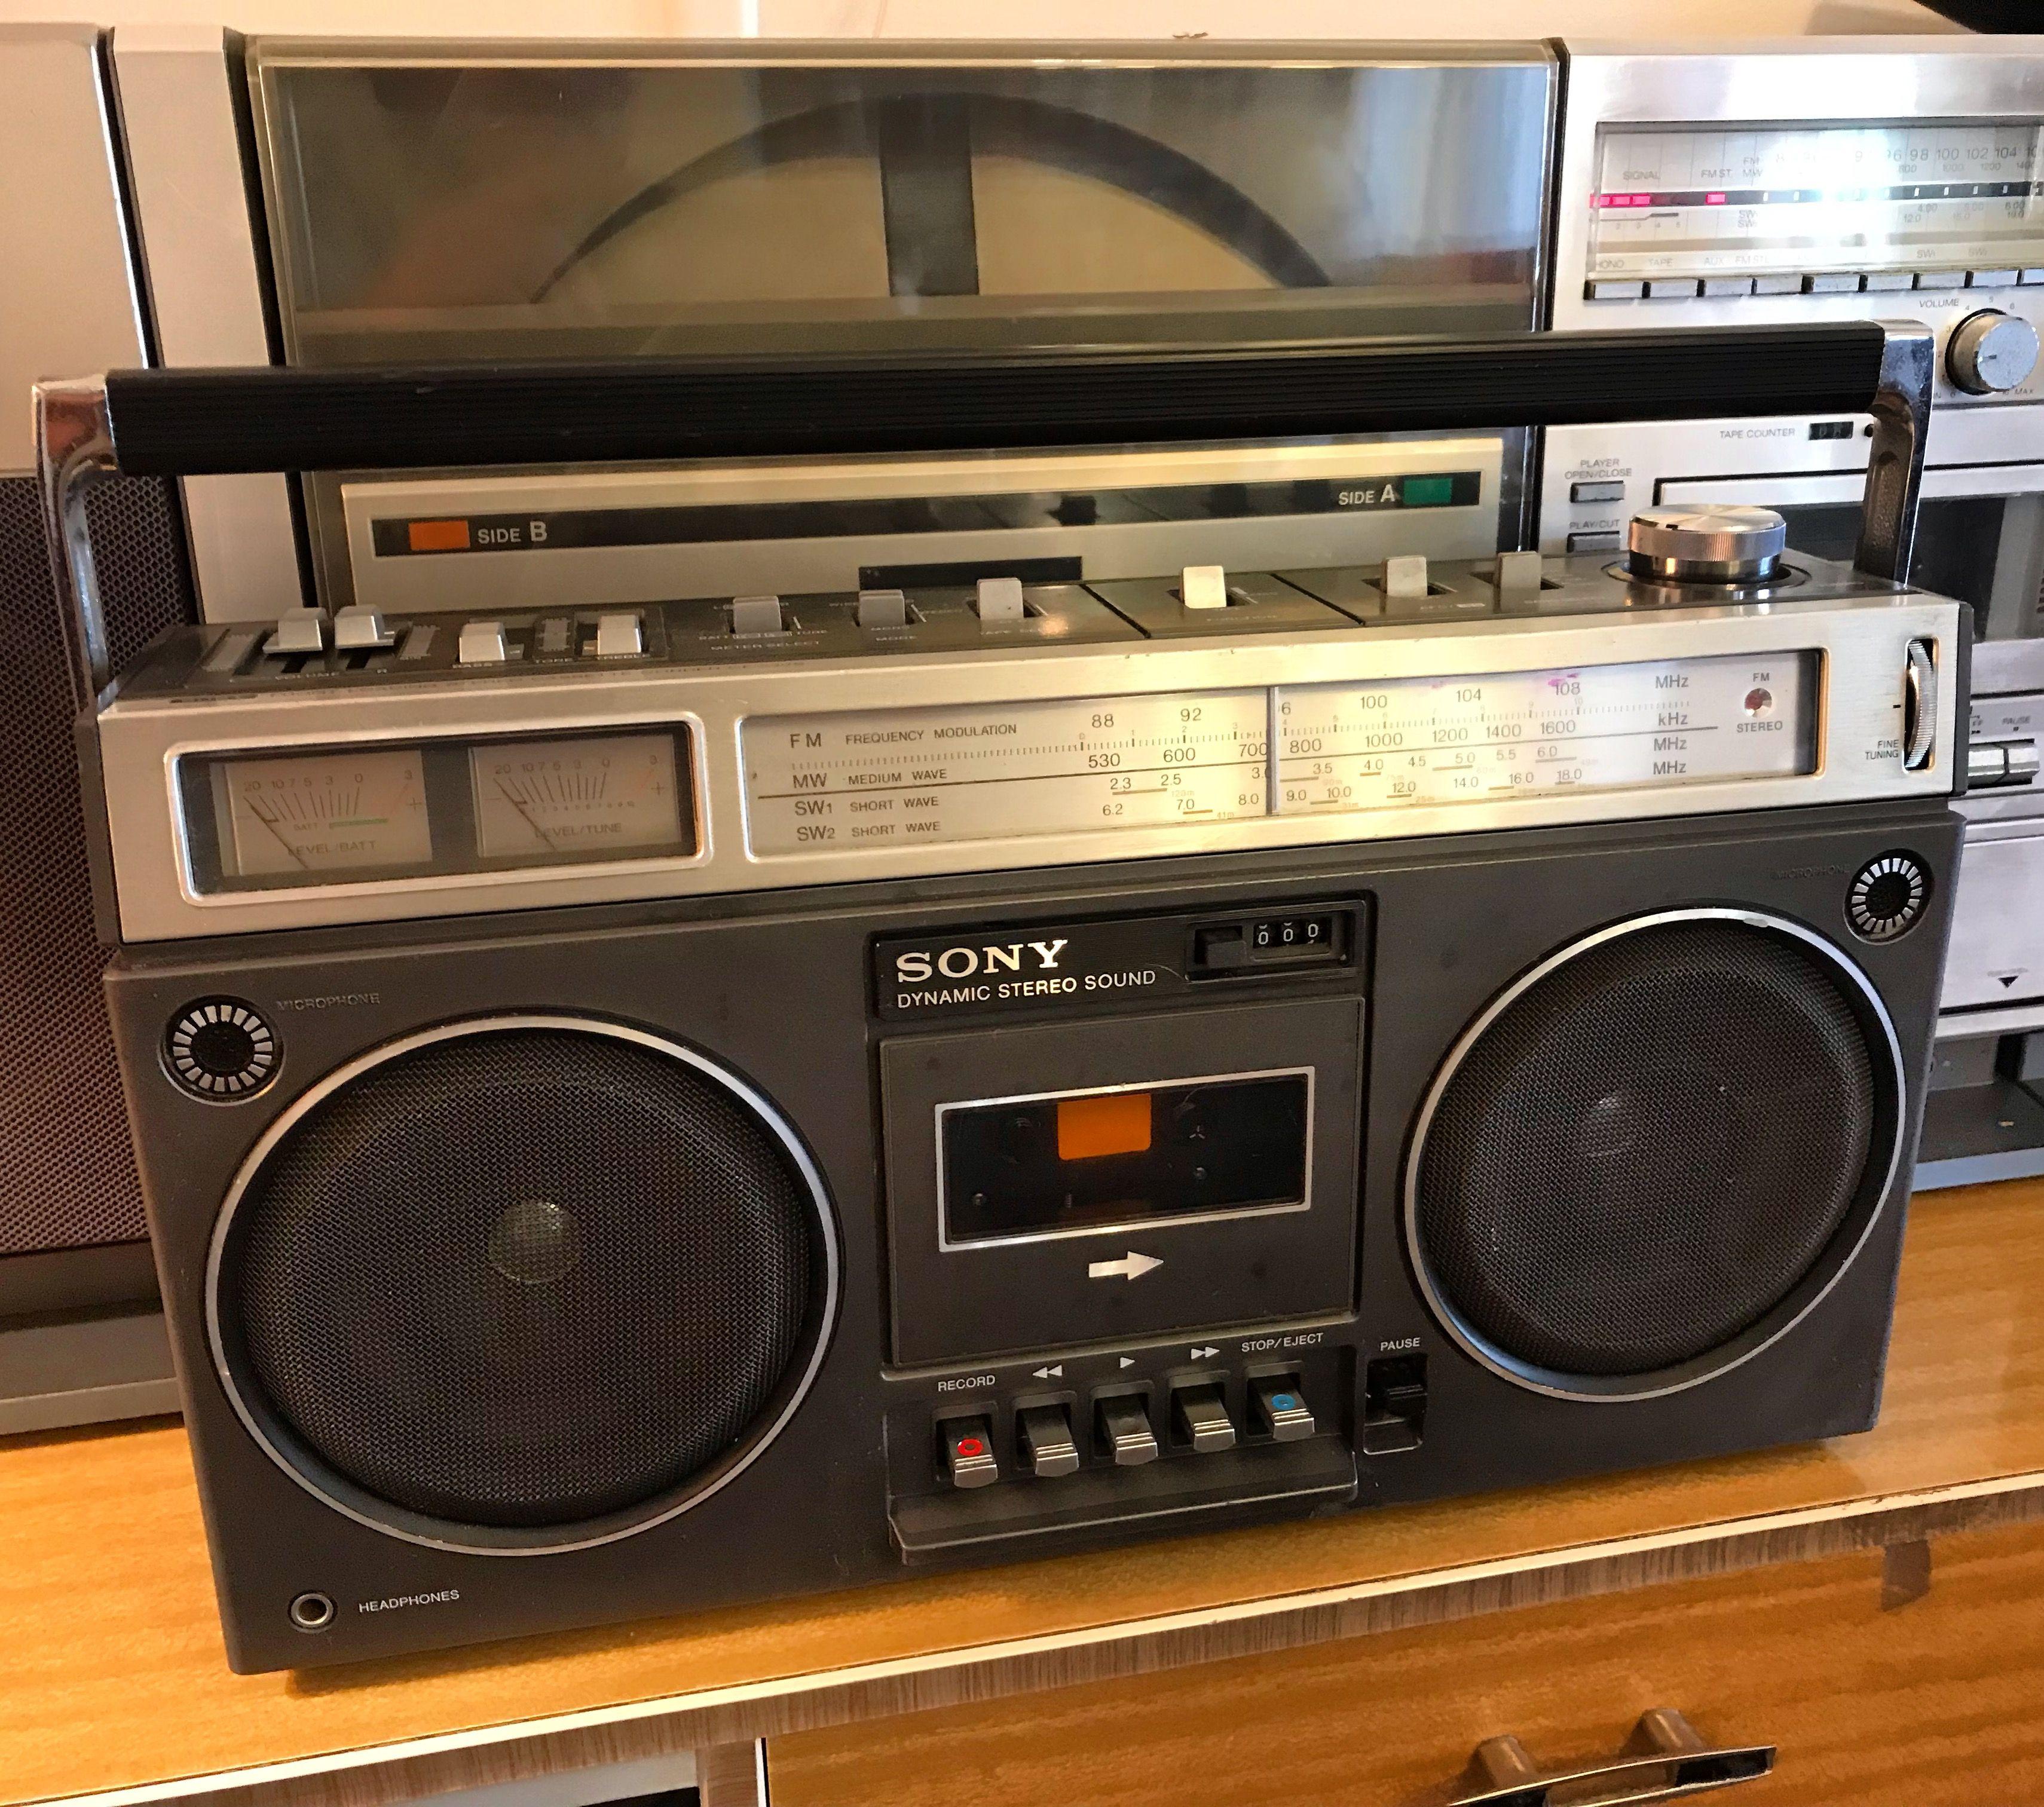 Sony Cf 530s Boombox Ghettoblaster Boombox Radio Cassette Tape Recorder